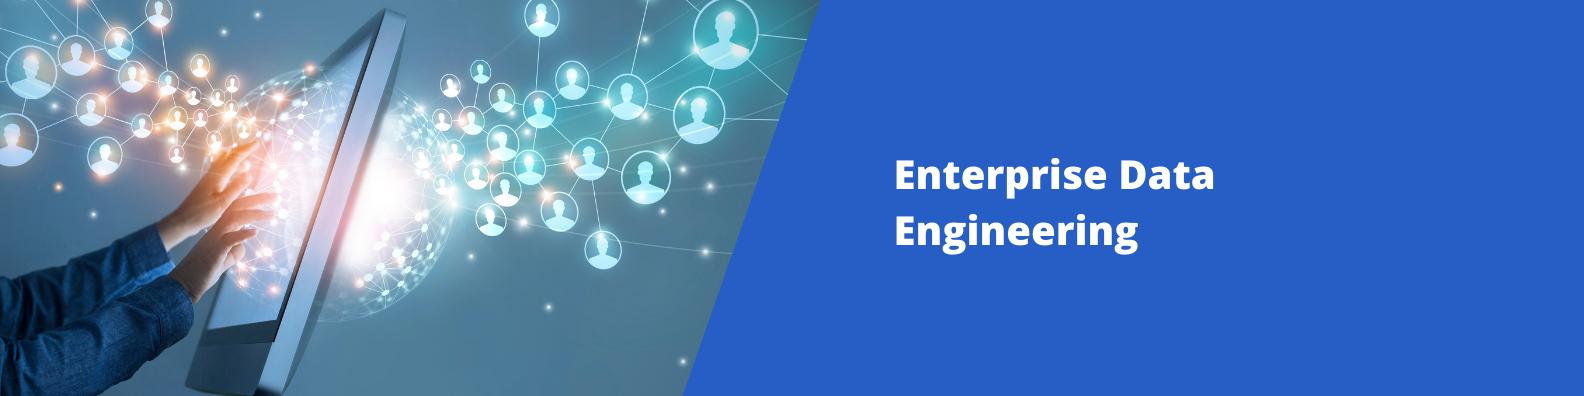 Enterprise Data Engineering